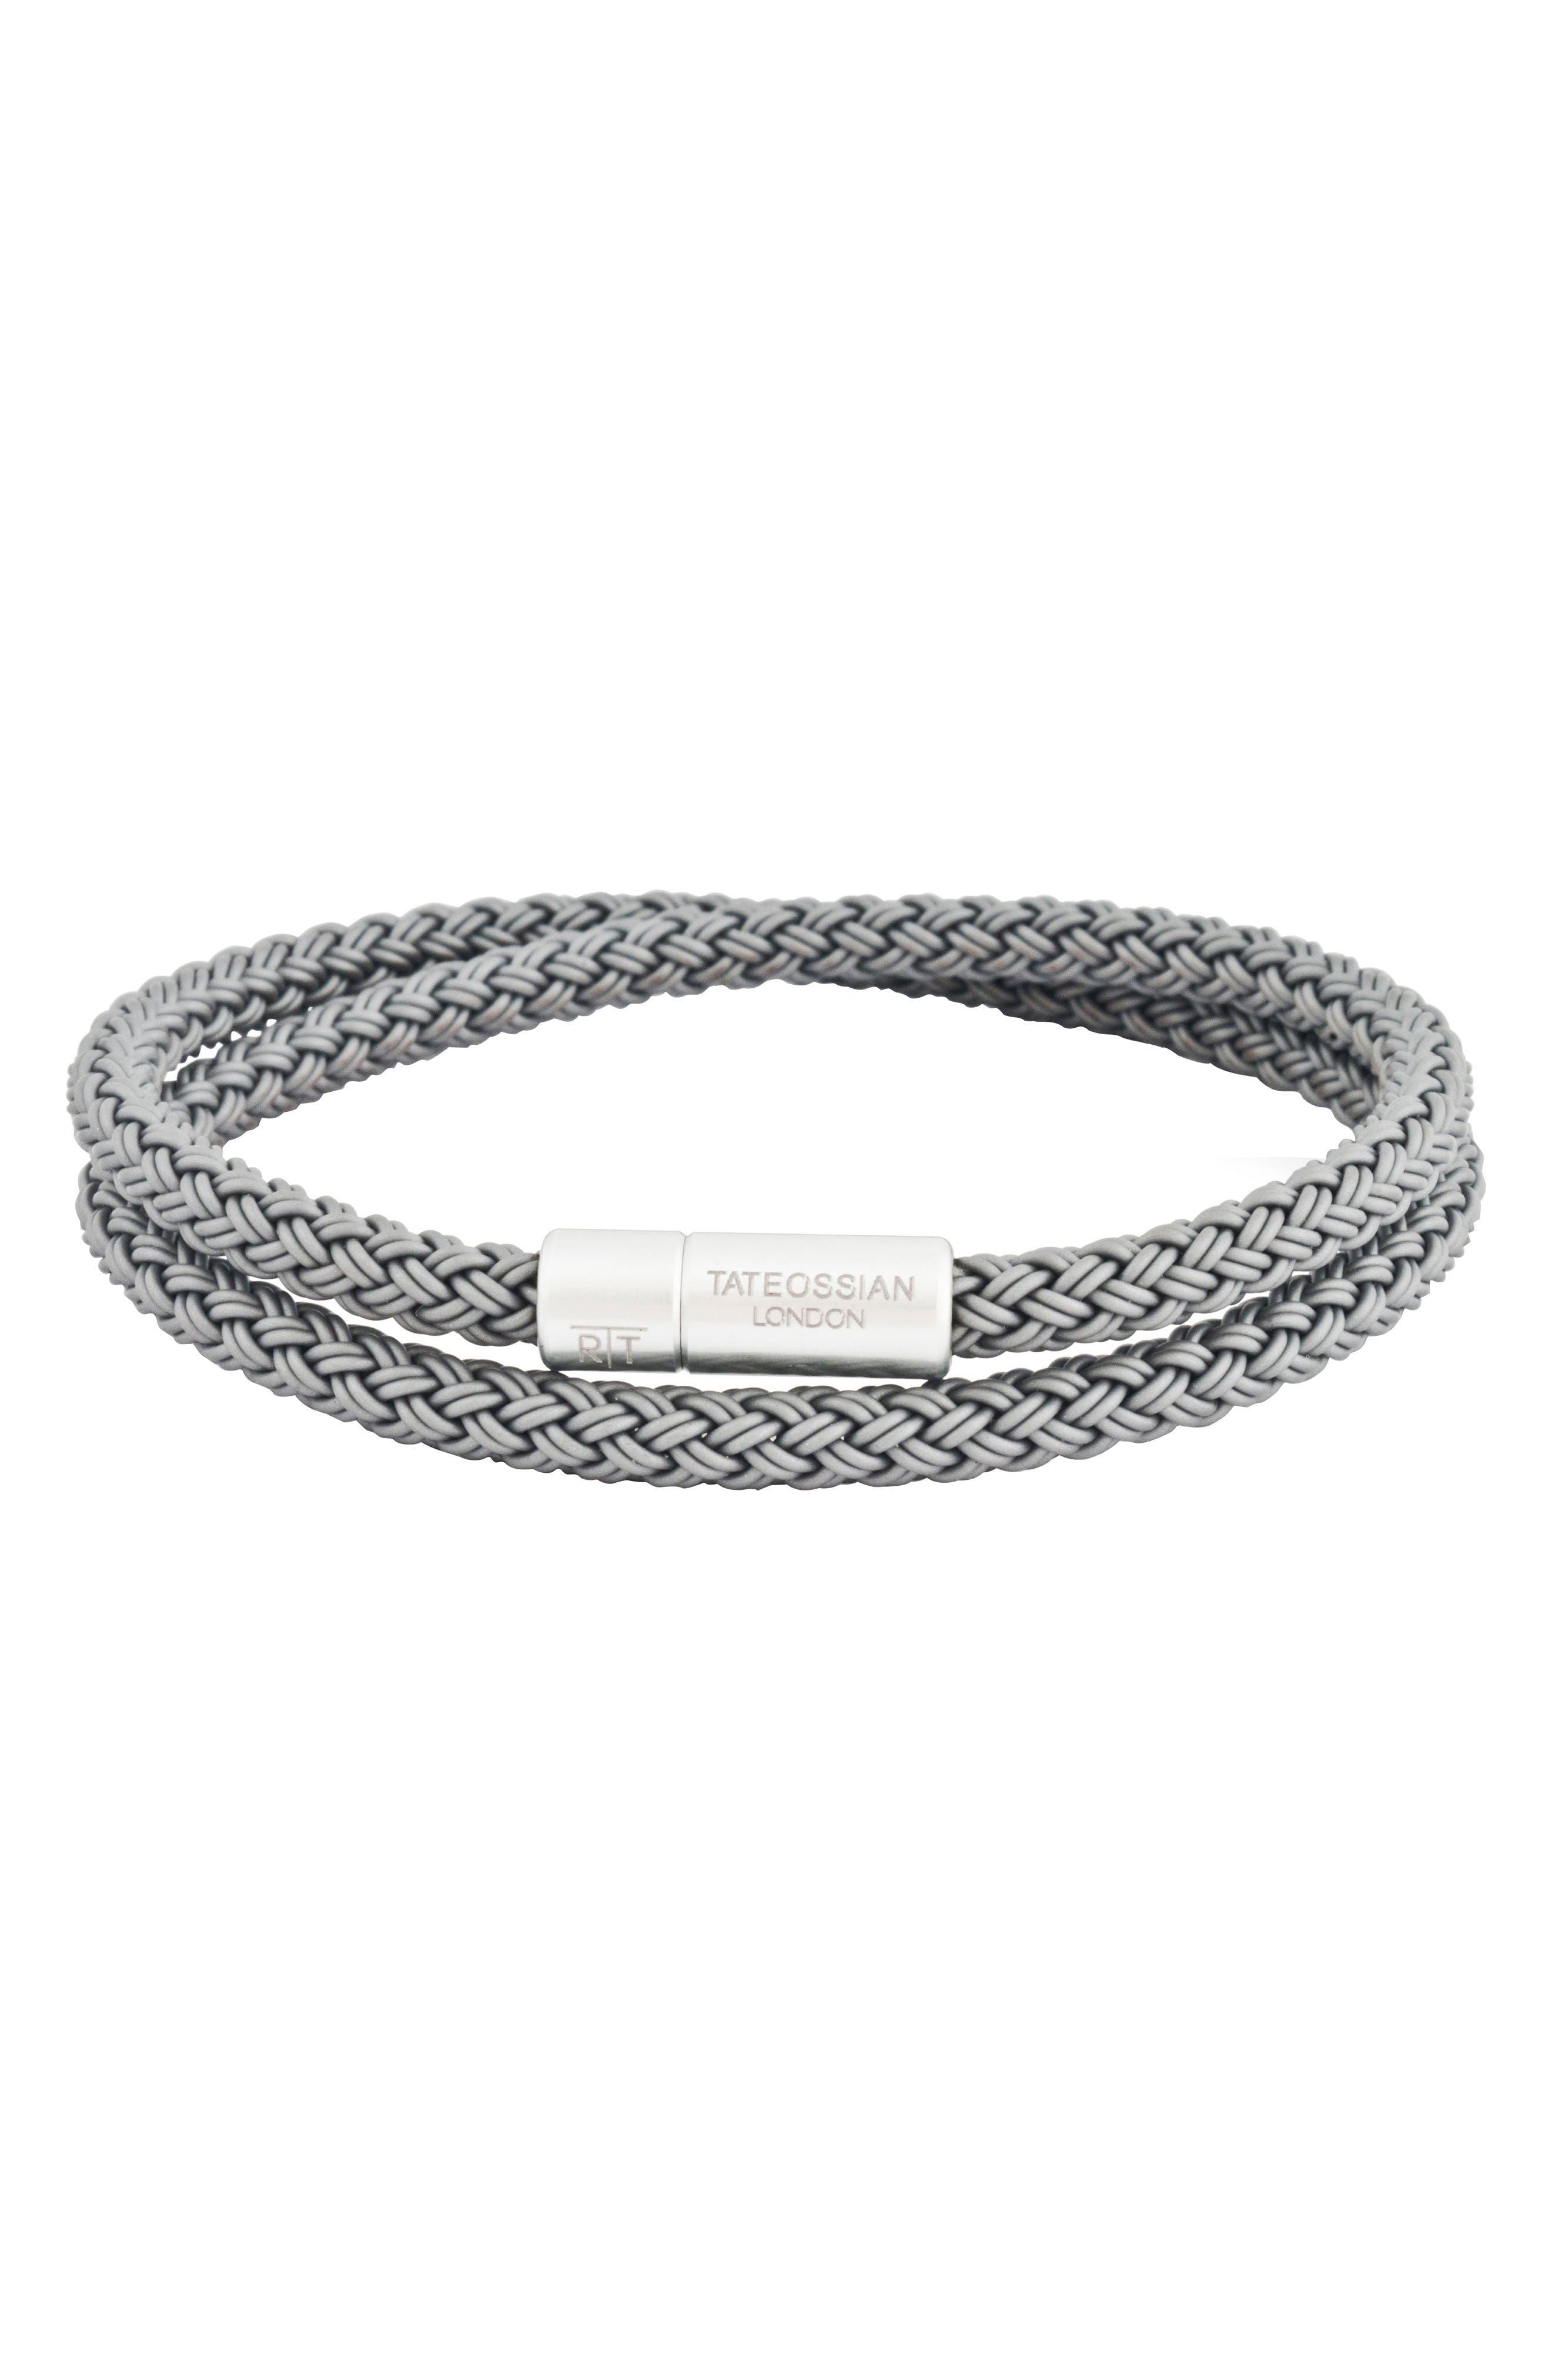 Tateossian Rubber Cable Wrap Bracelet